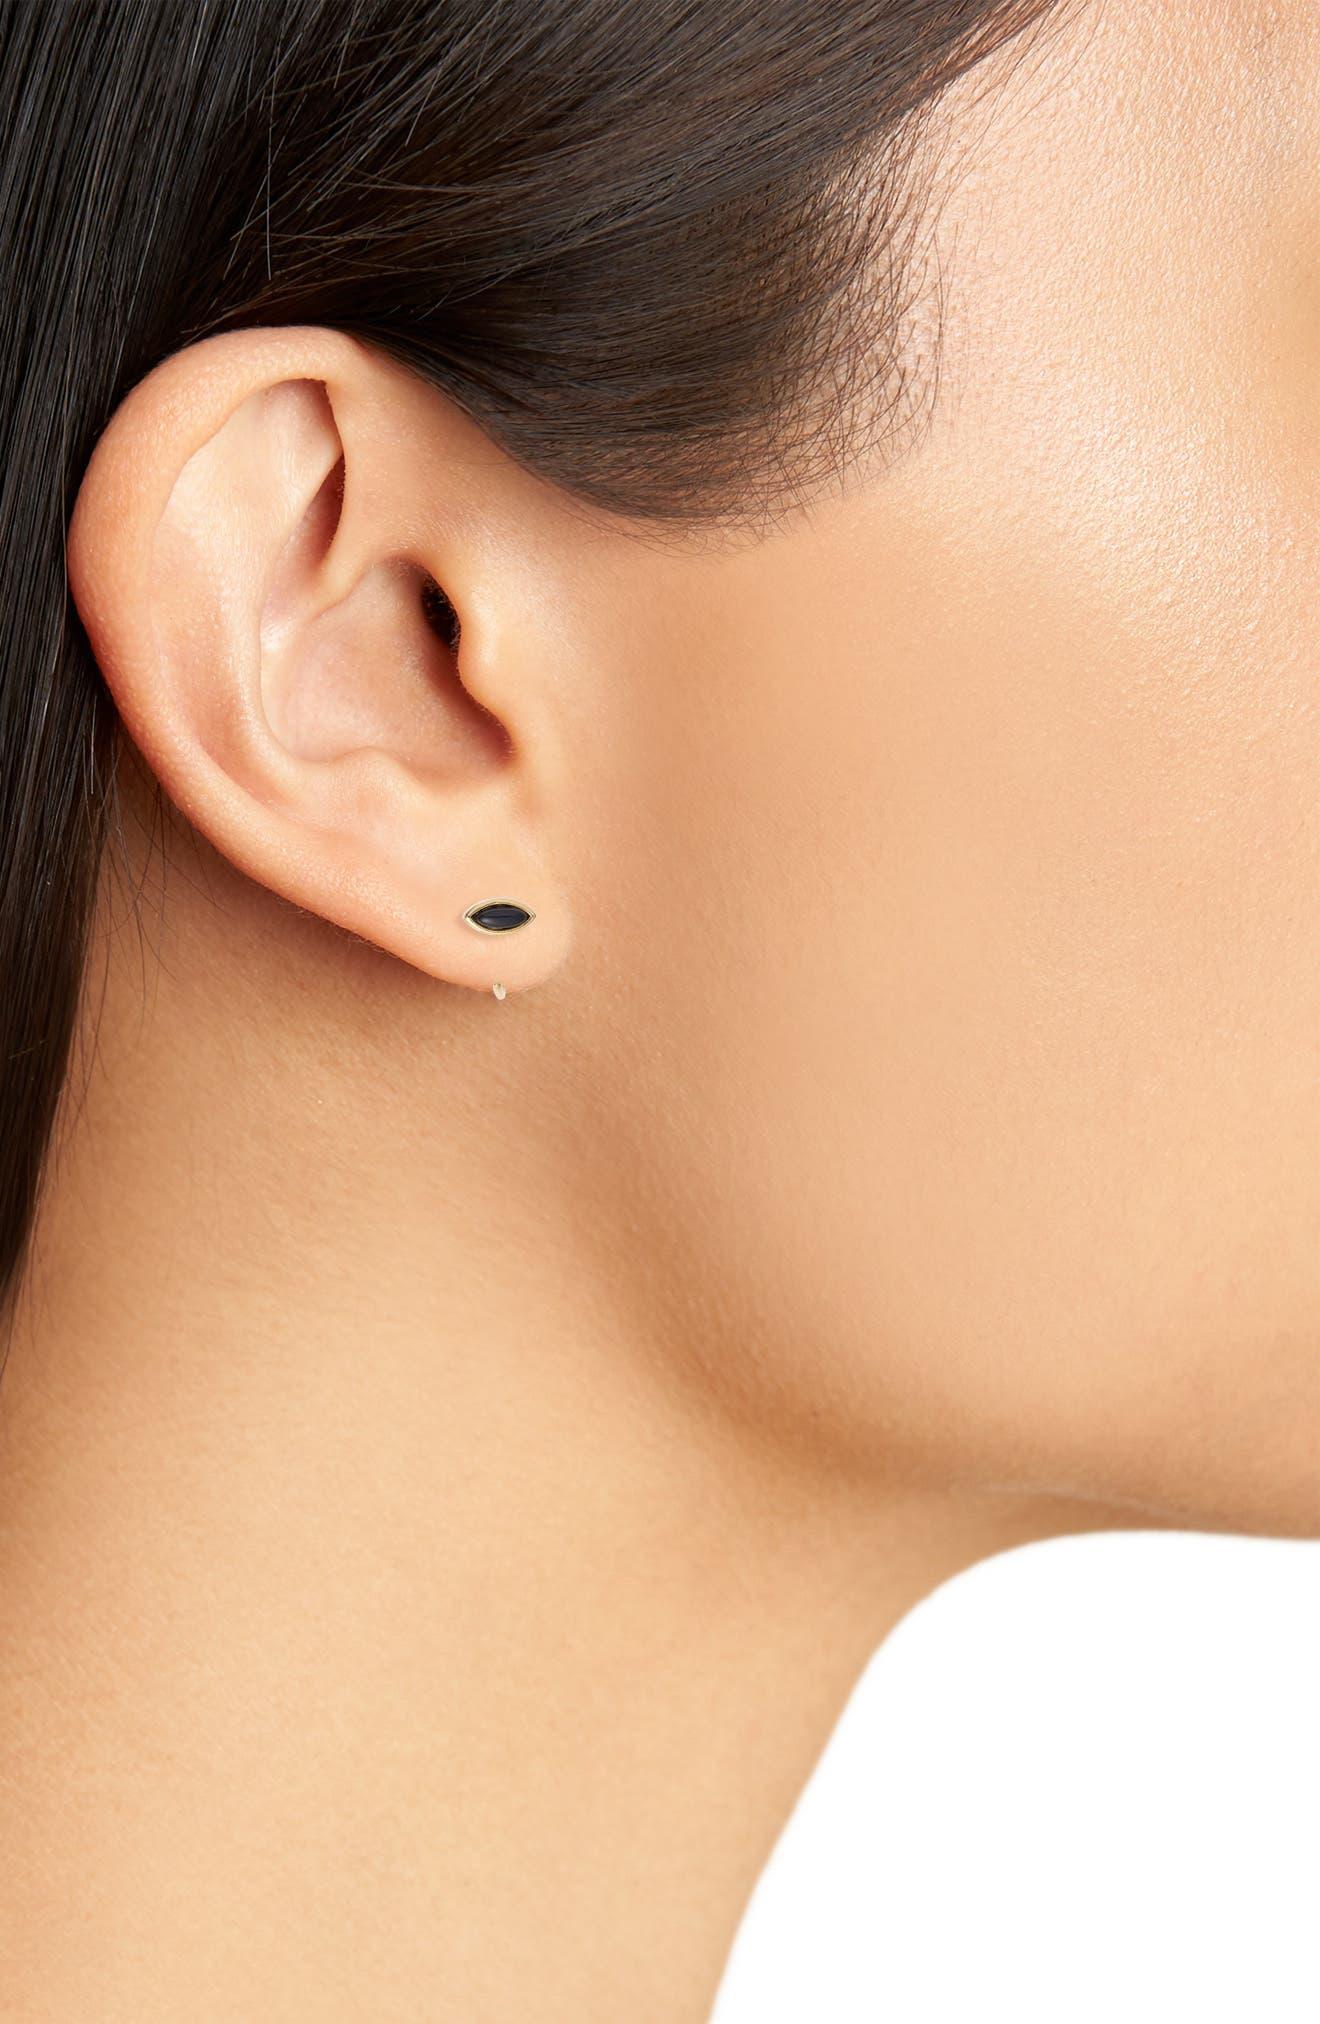 Jo Earrings,                             Alternate thumbnail 2, color,                             Onyx/ Gold